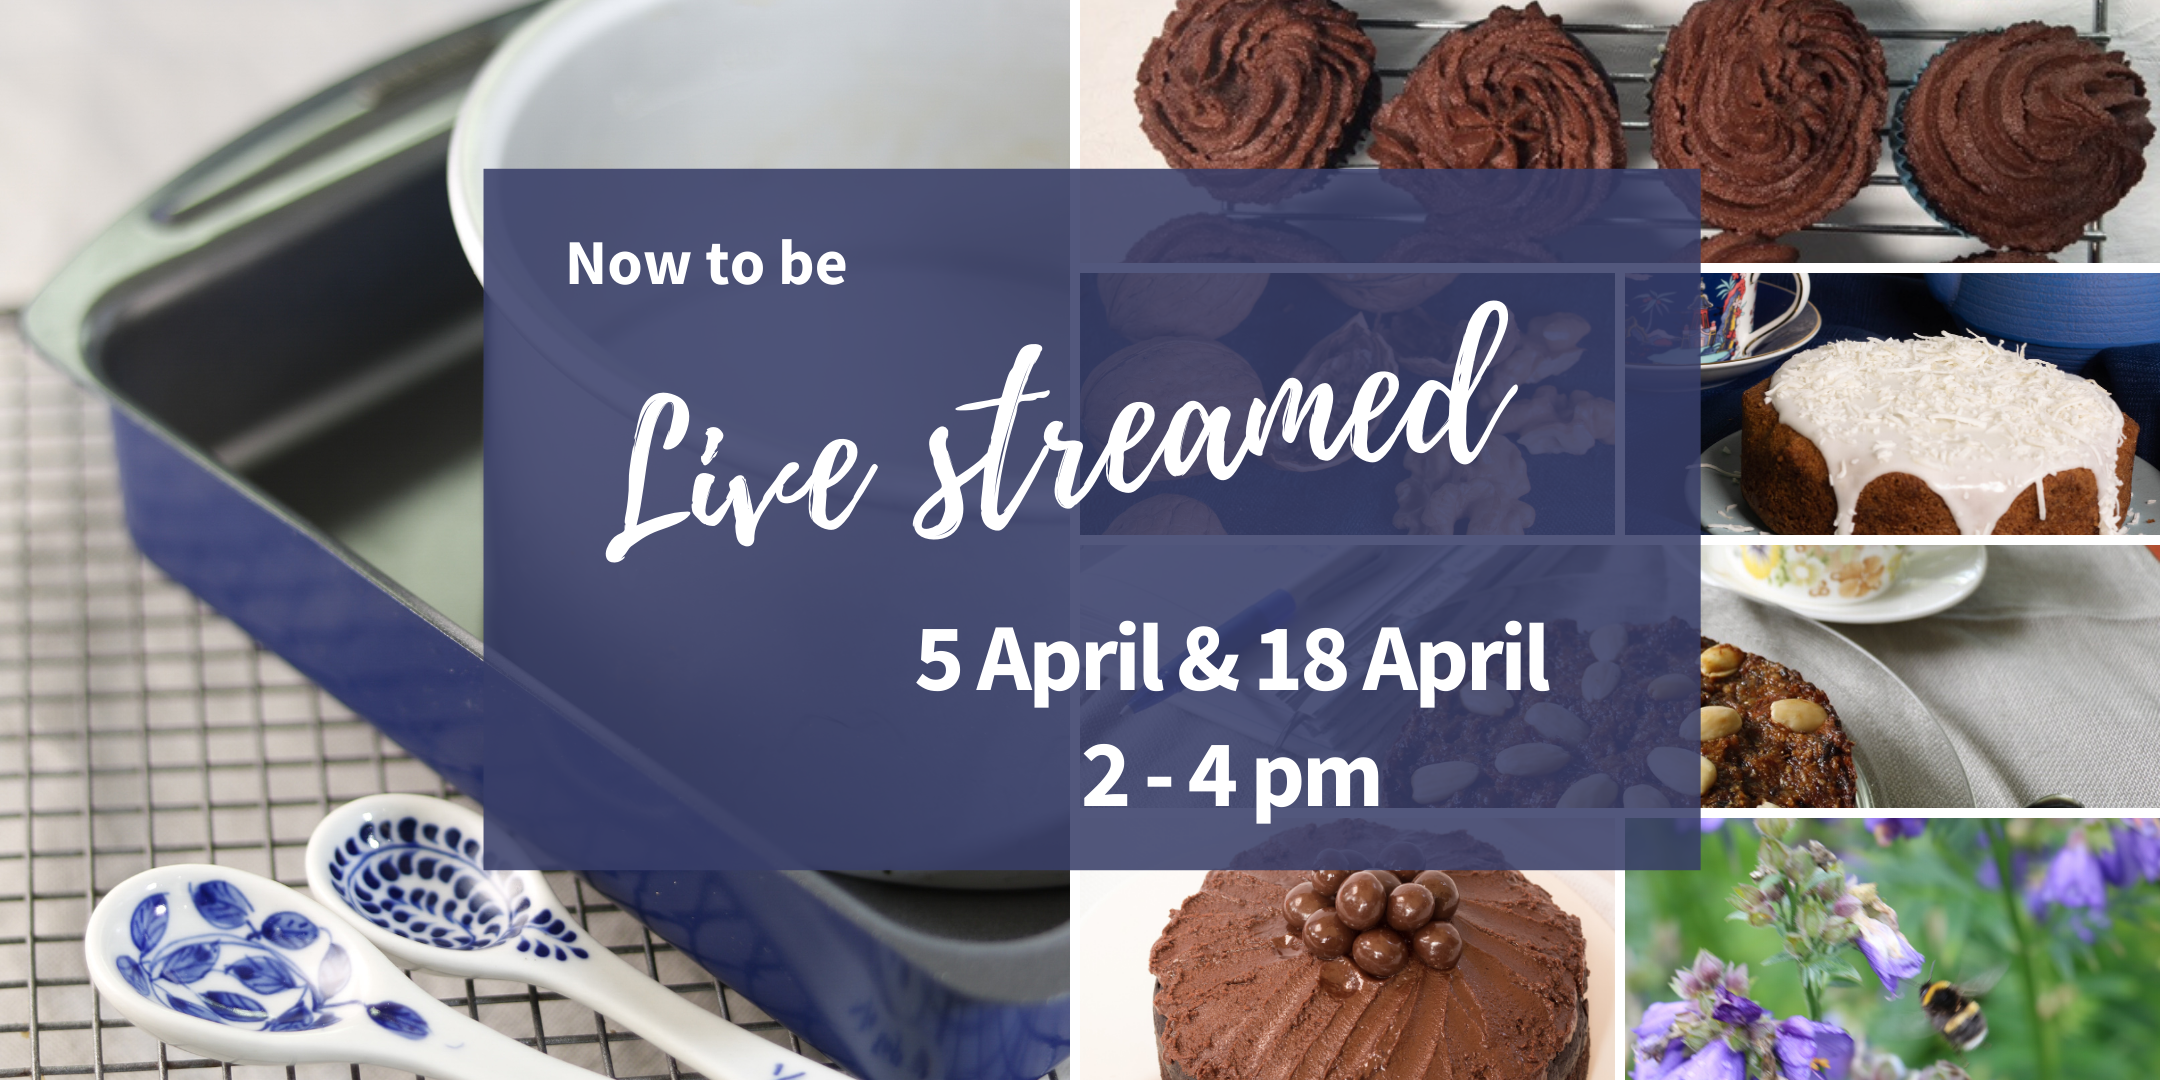 Now to be live streamed Plant Based Vegan Cake Baking Workshop